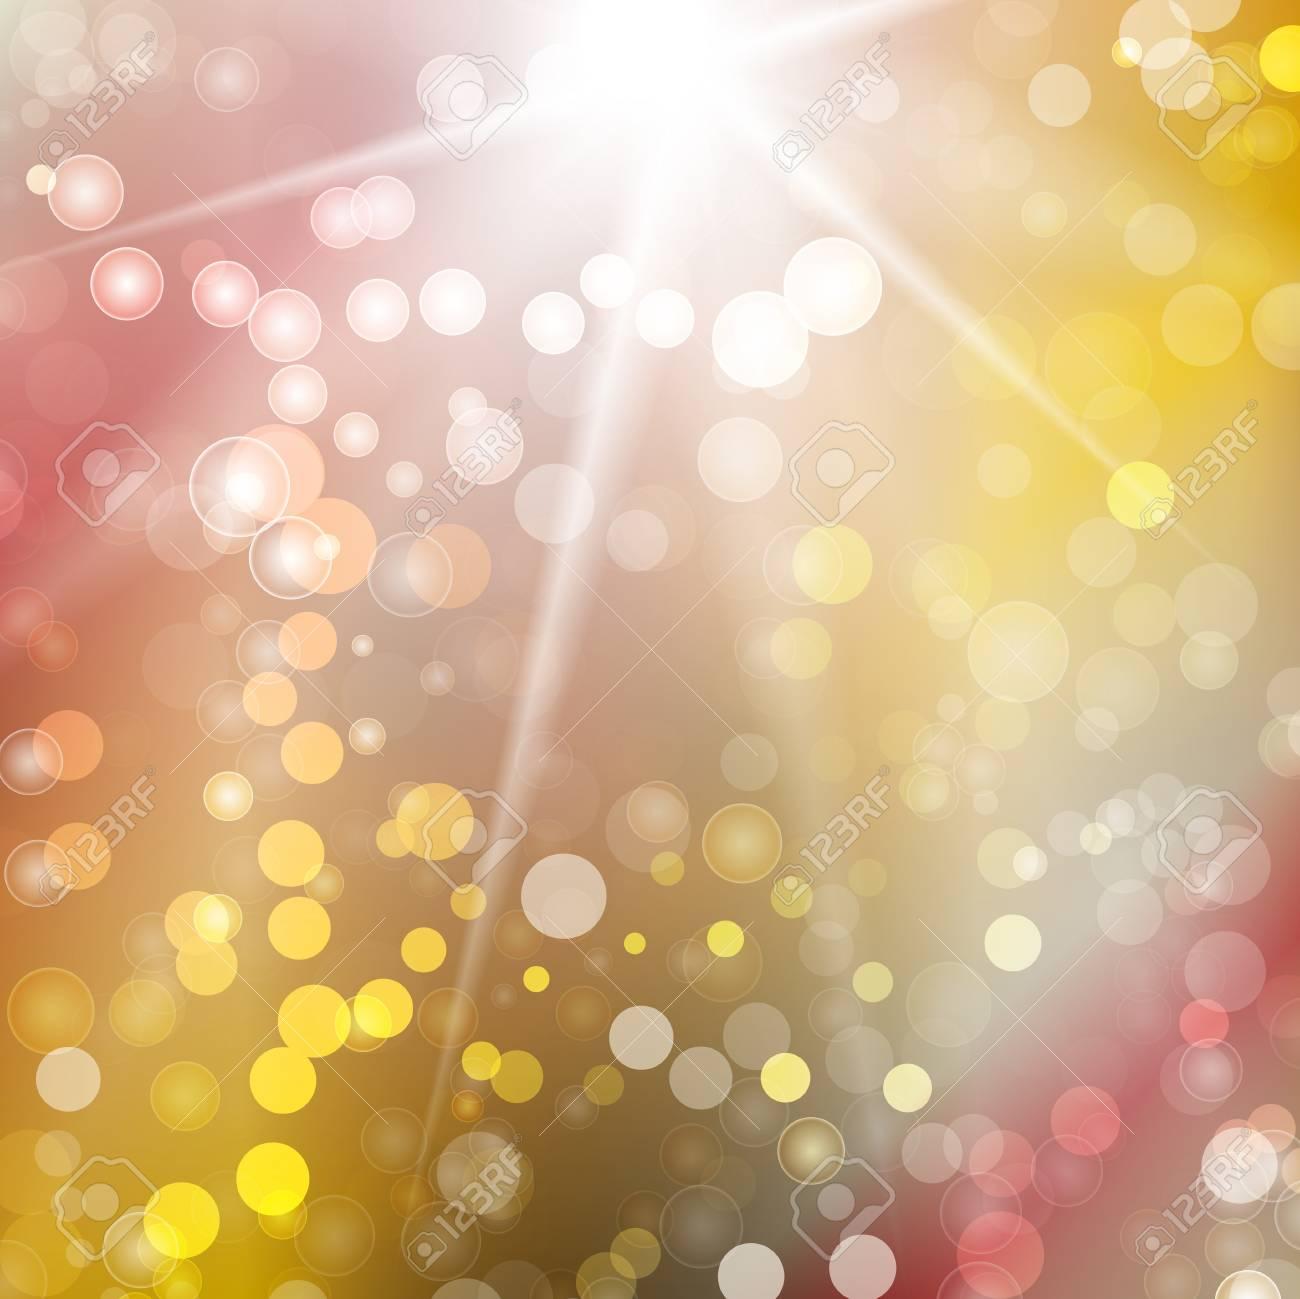 Festive bokeh lights abstract background. Vector illustration Stock Vector - 16675096